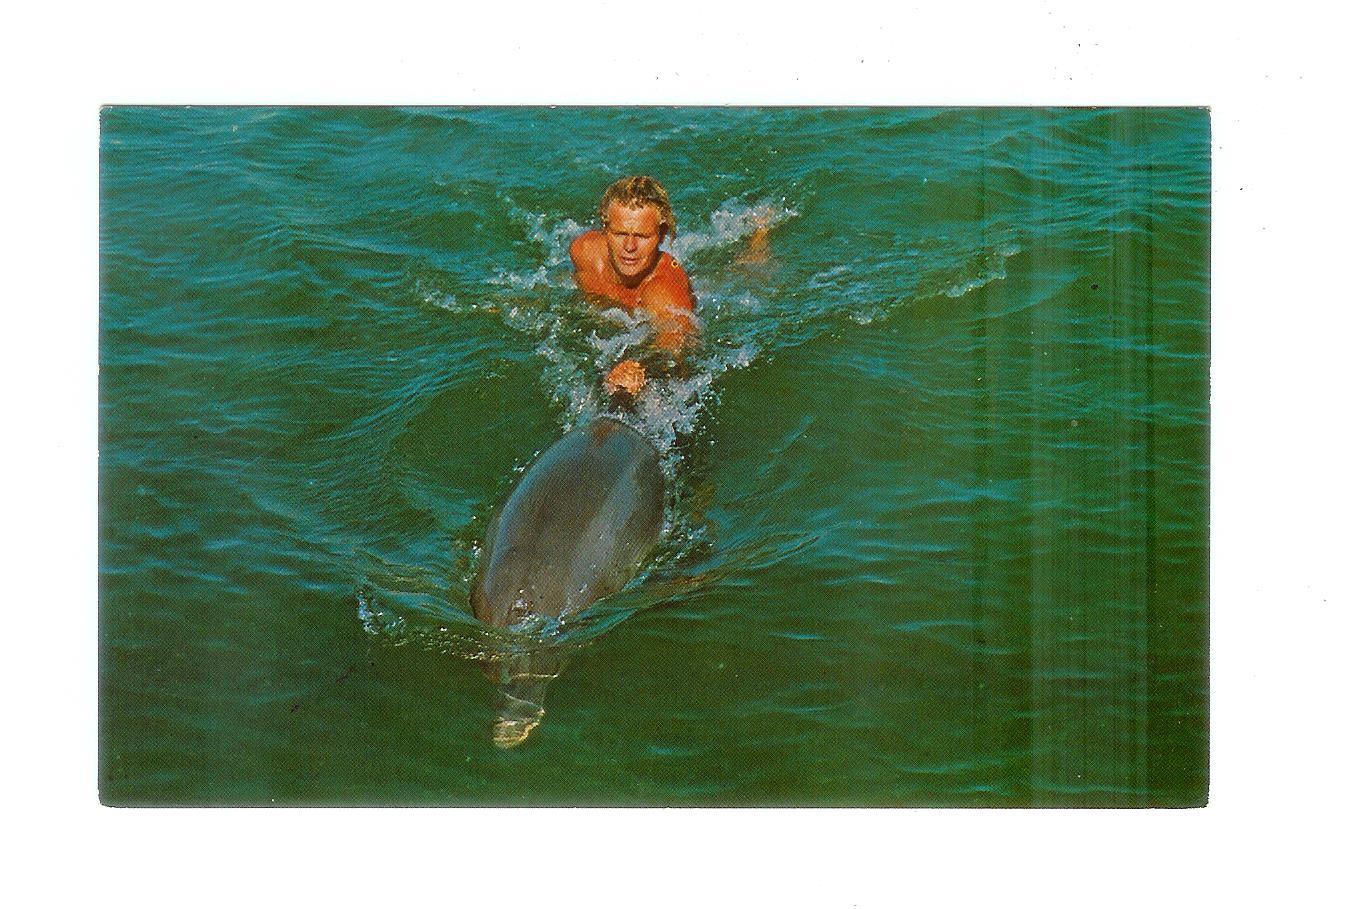 Chrome postcard. Mitzi, star of Flipper, Santini's Porpoise Training  School, Grassy Key, Florida.